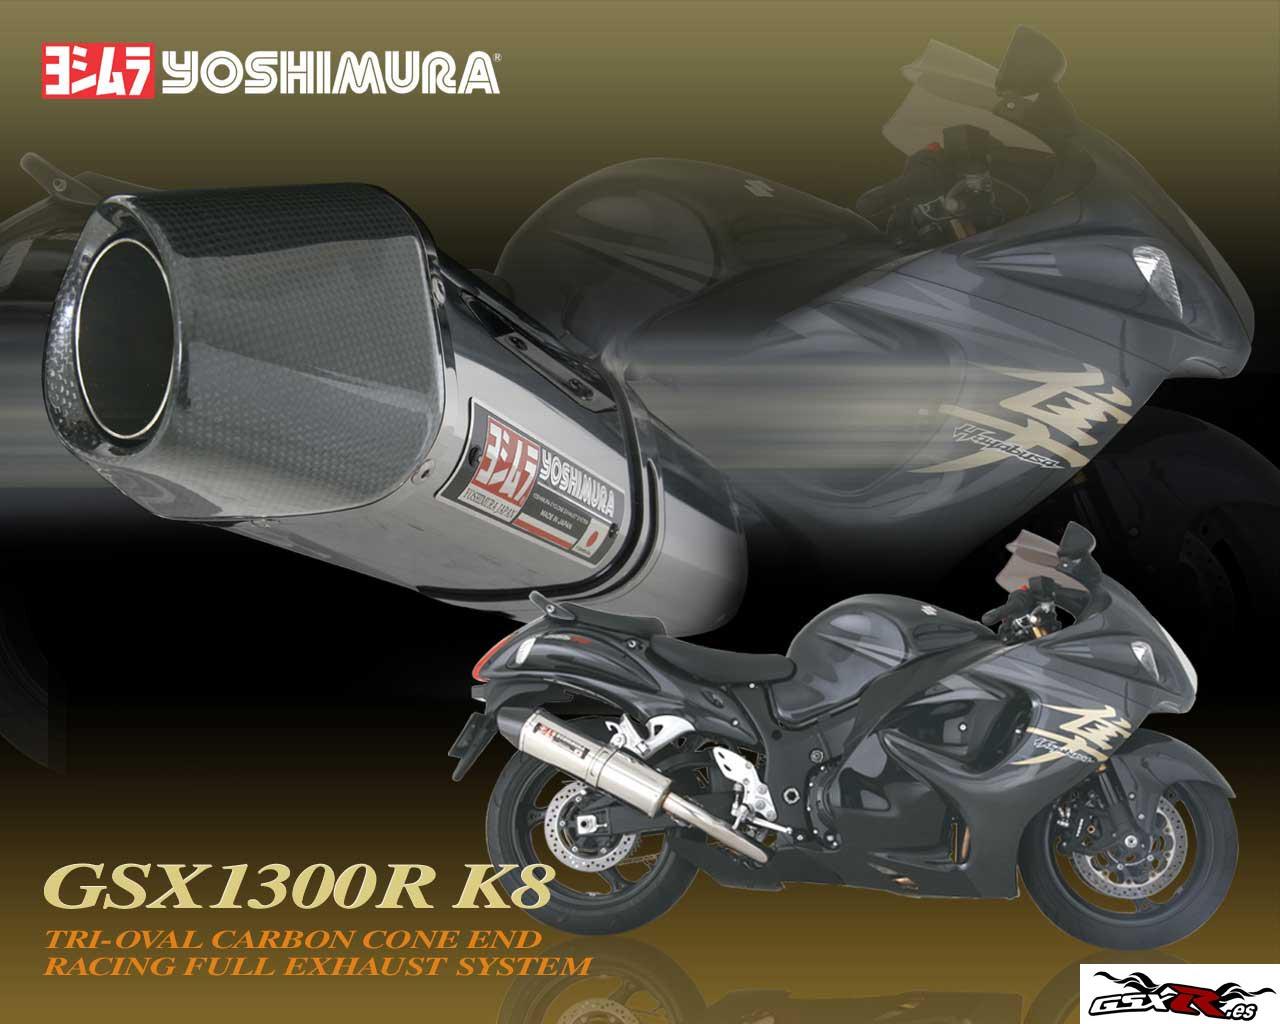 suzuki gsx-r 1300 hayabusa escape yoshimura wallpaper fondo de escritorio